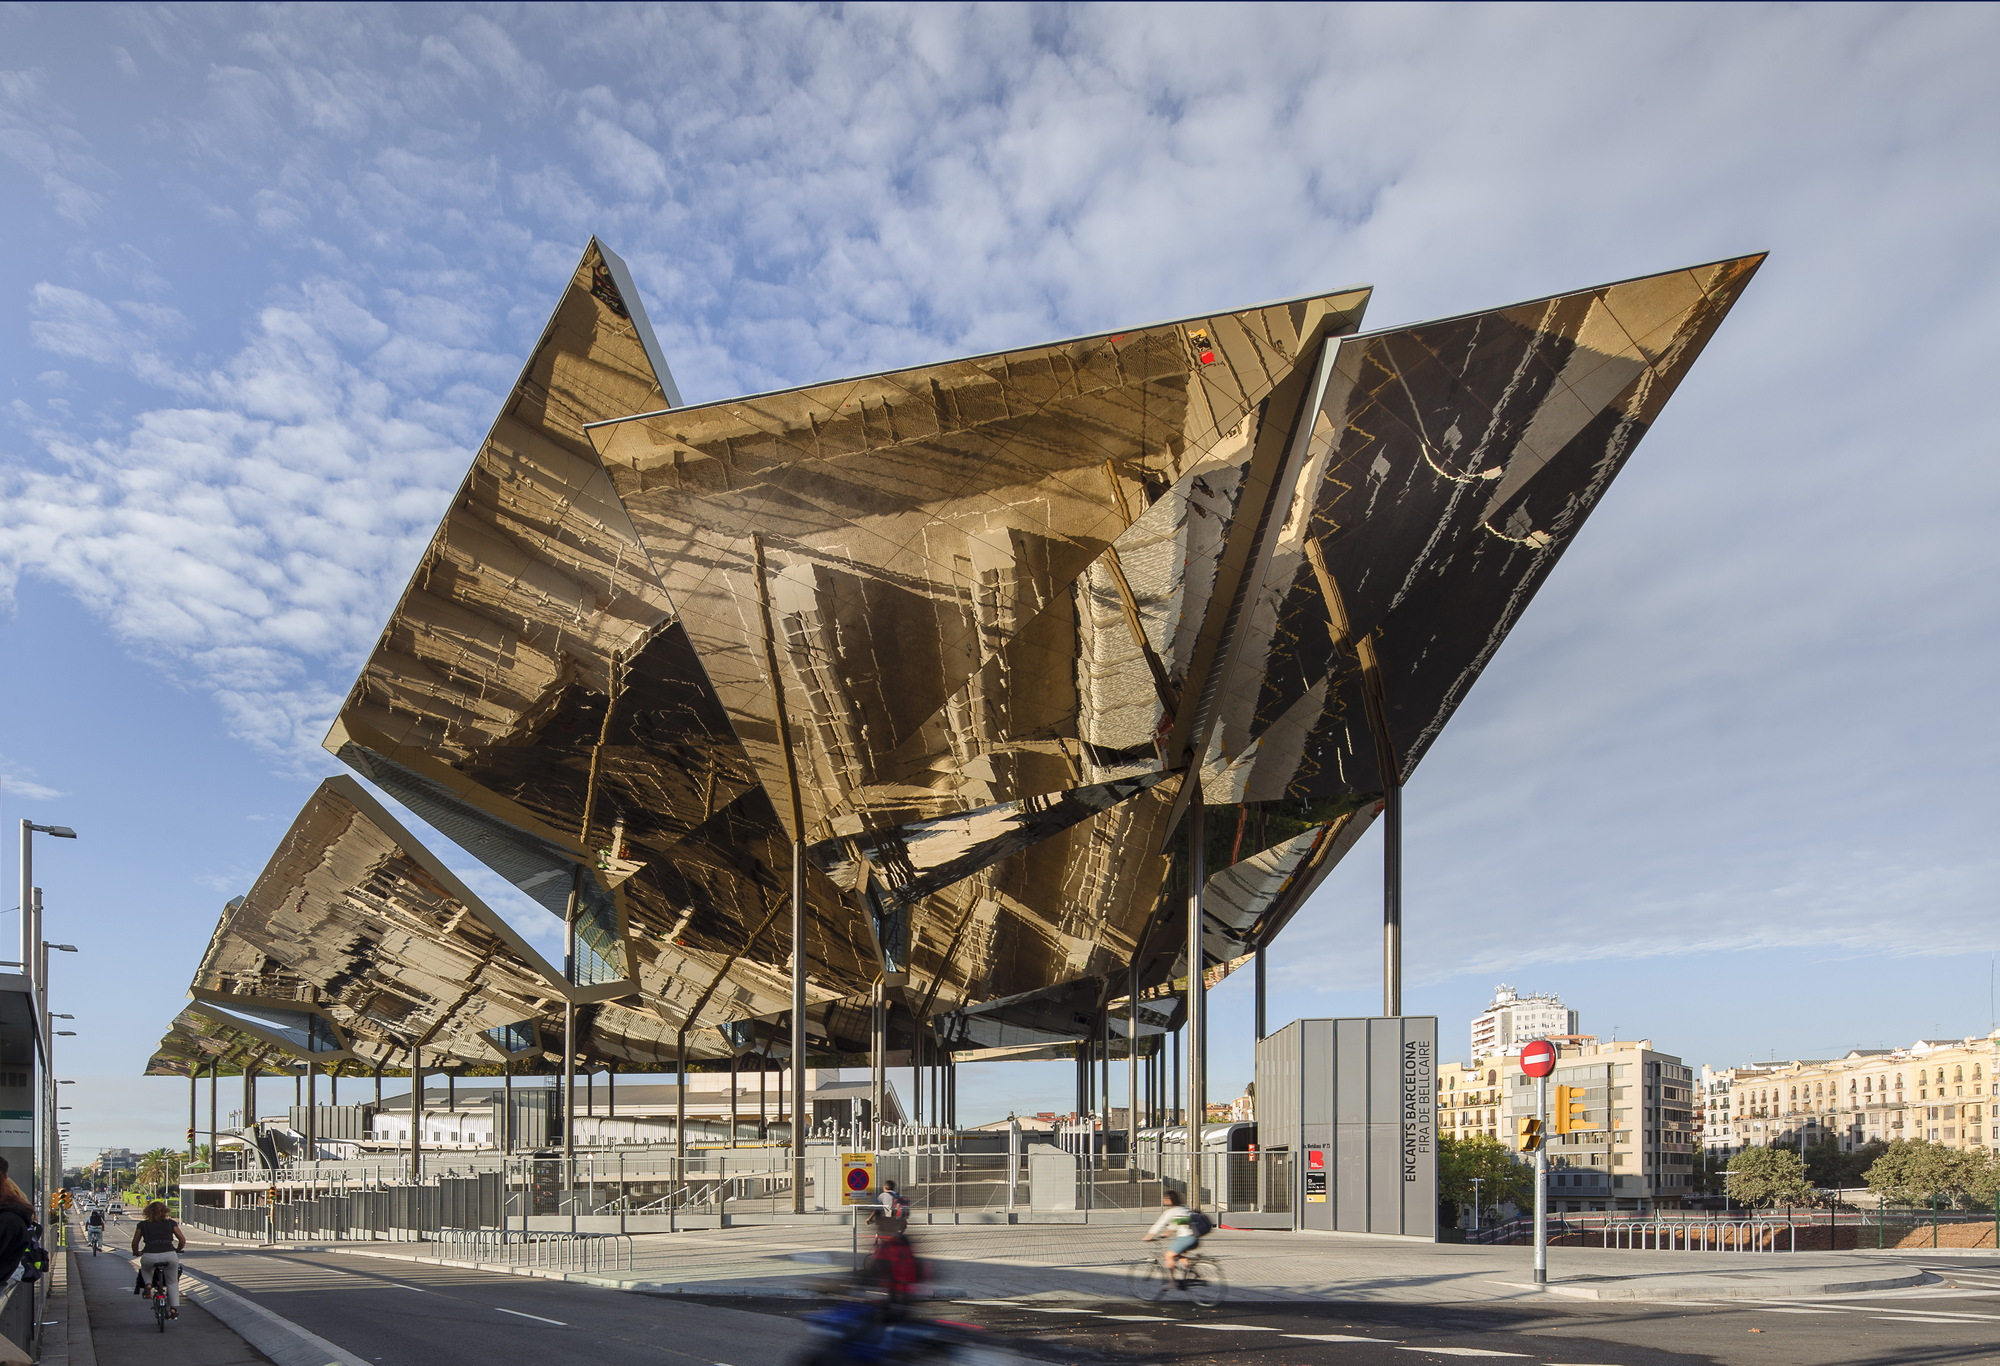 Mercat encants b720 ferm n v zquez arquitectos archdaily for Architettura contemporanea barcellona